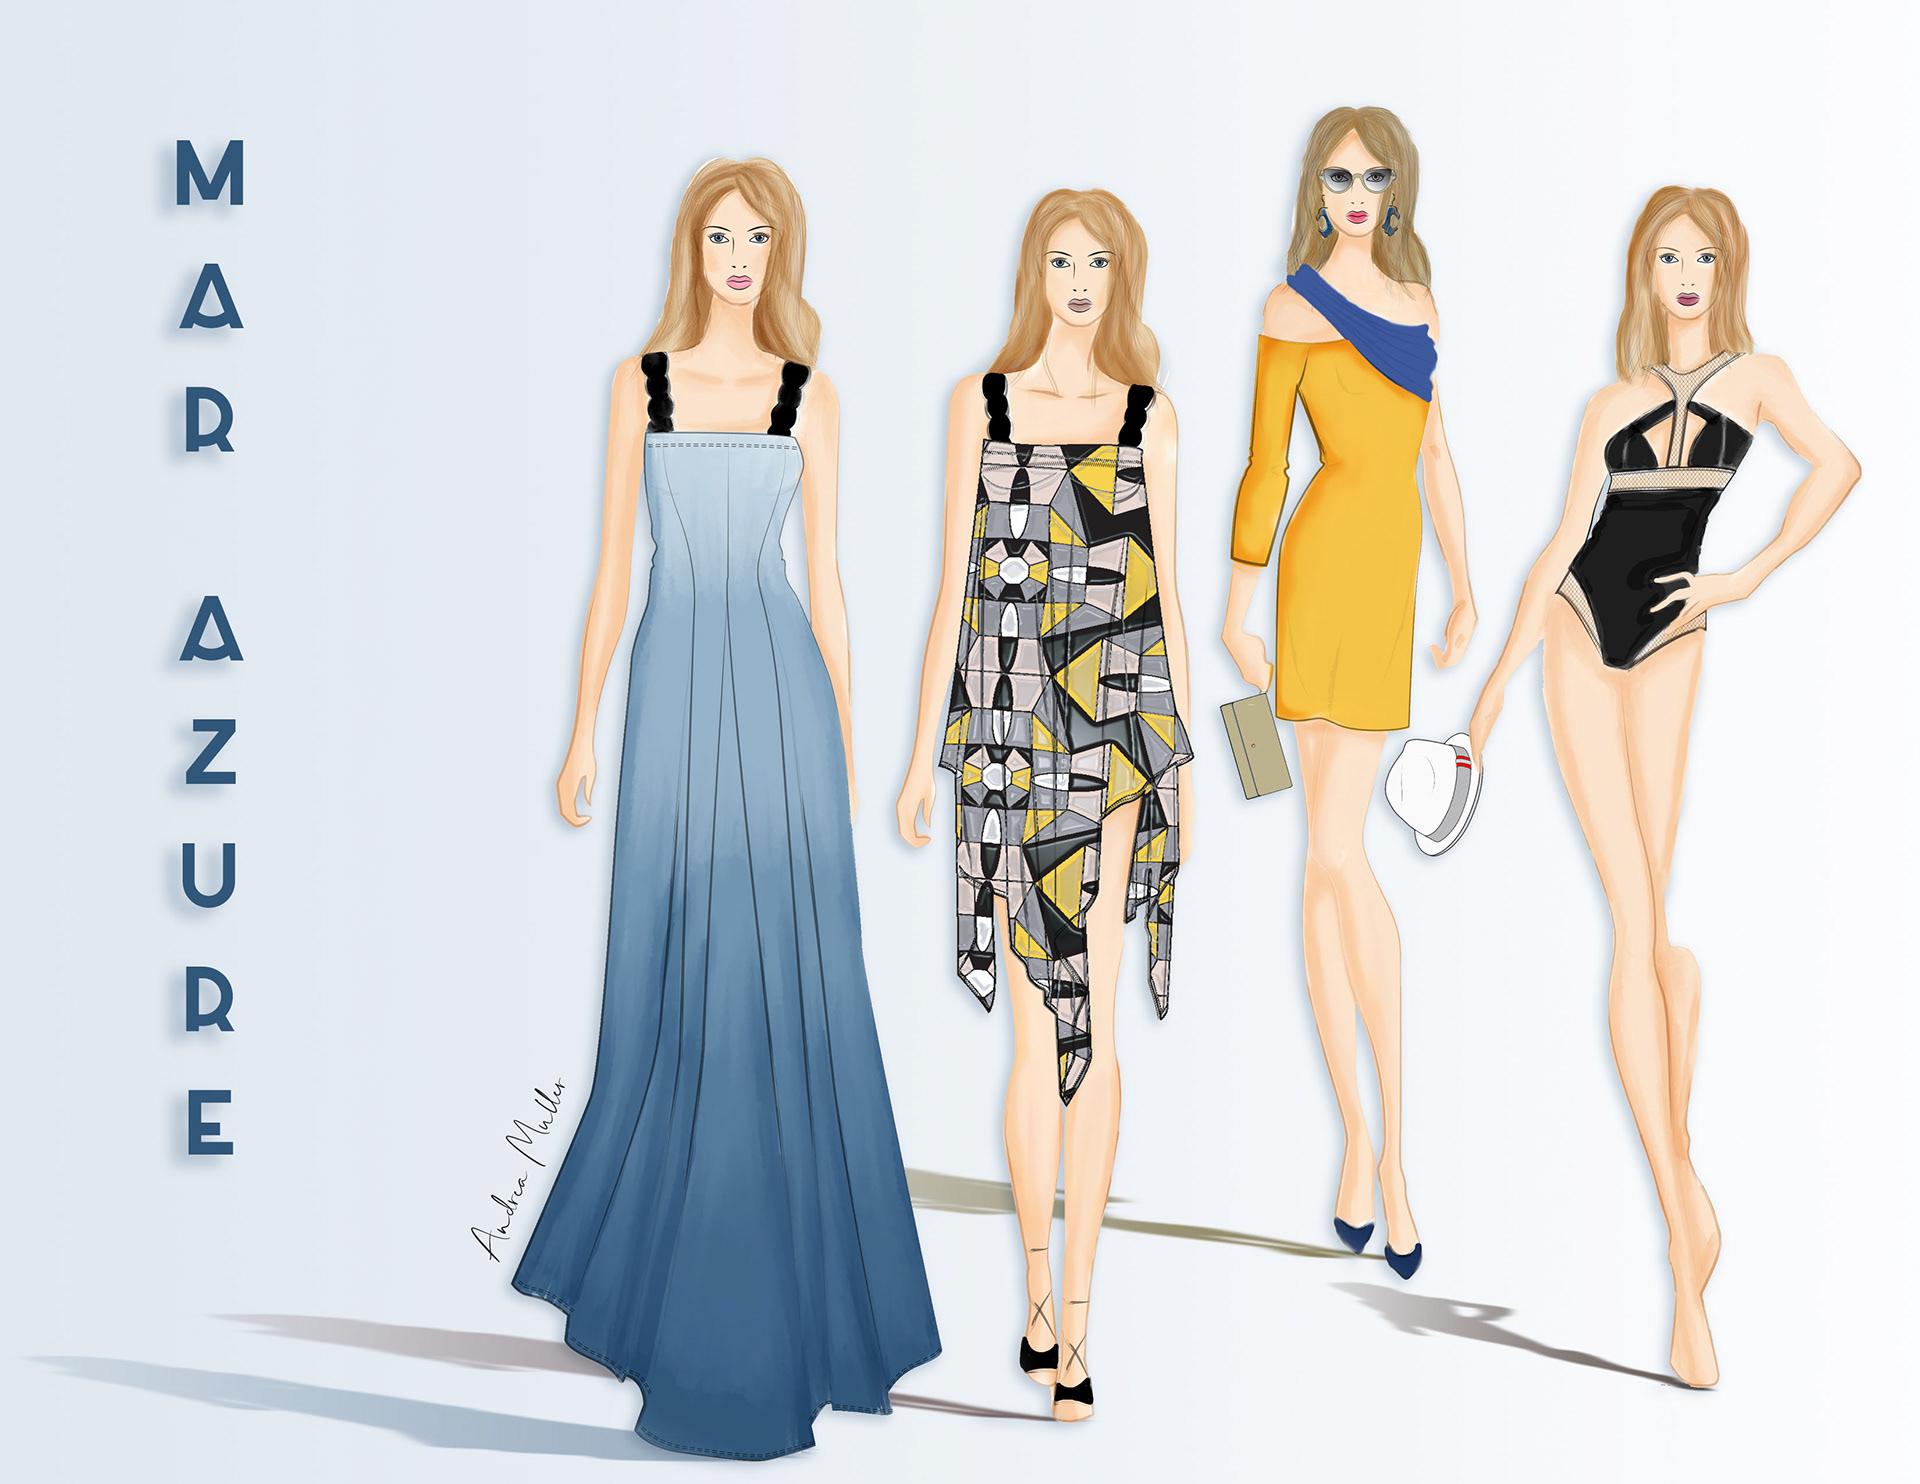 Andrea Muller Fashion Designer Illustrator Fashion Illustrations